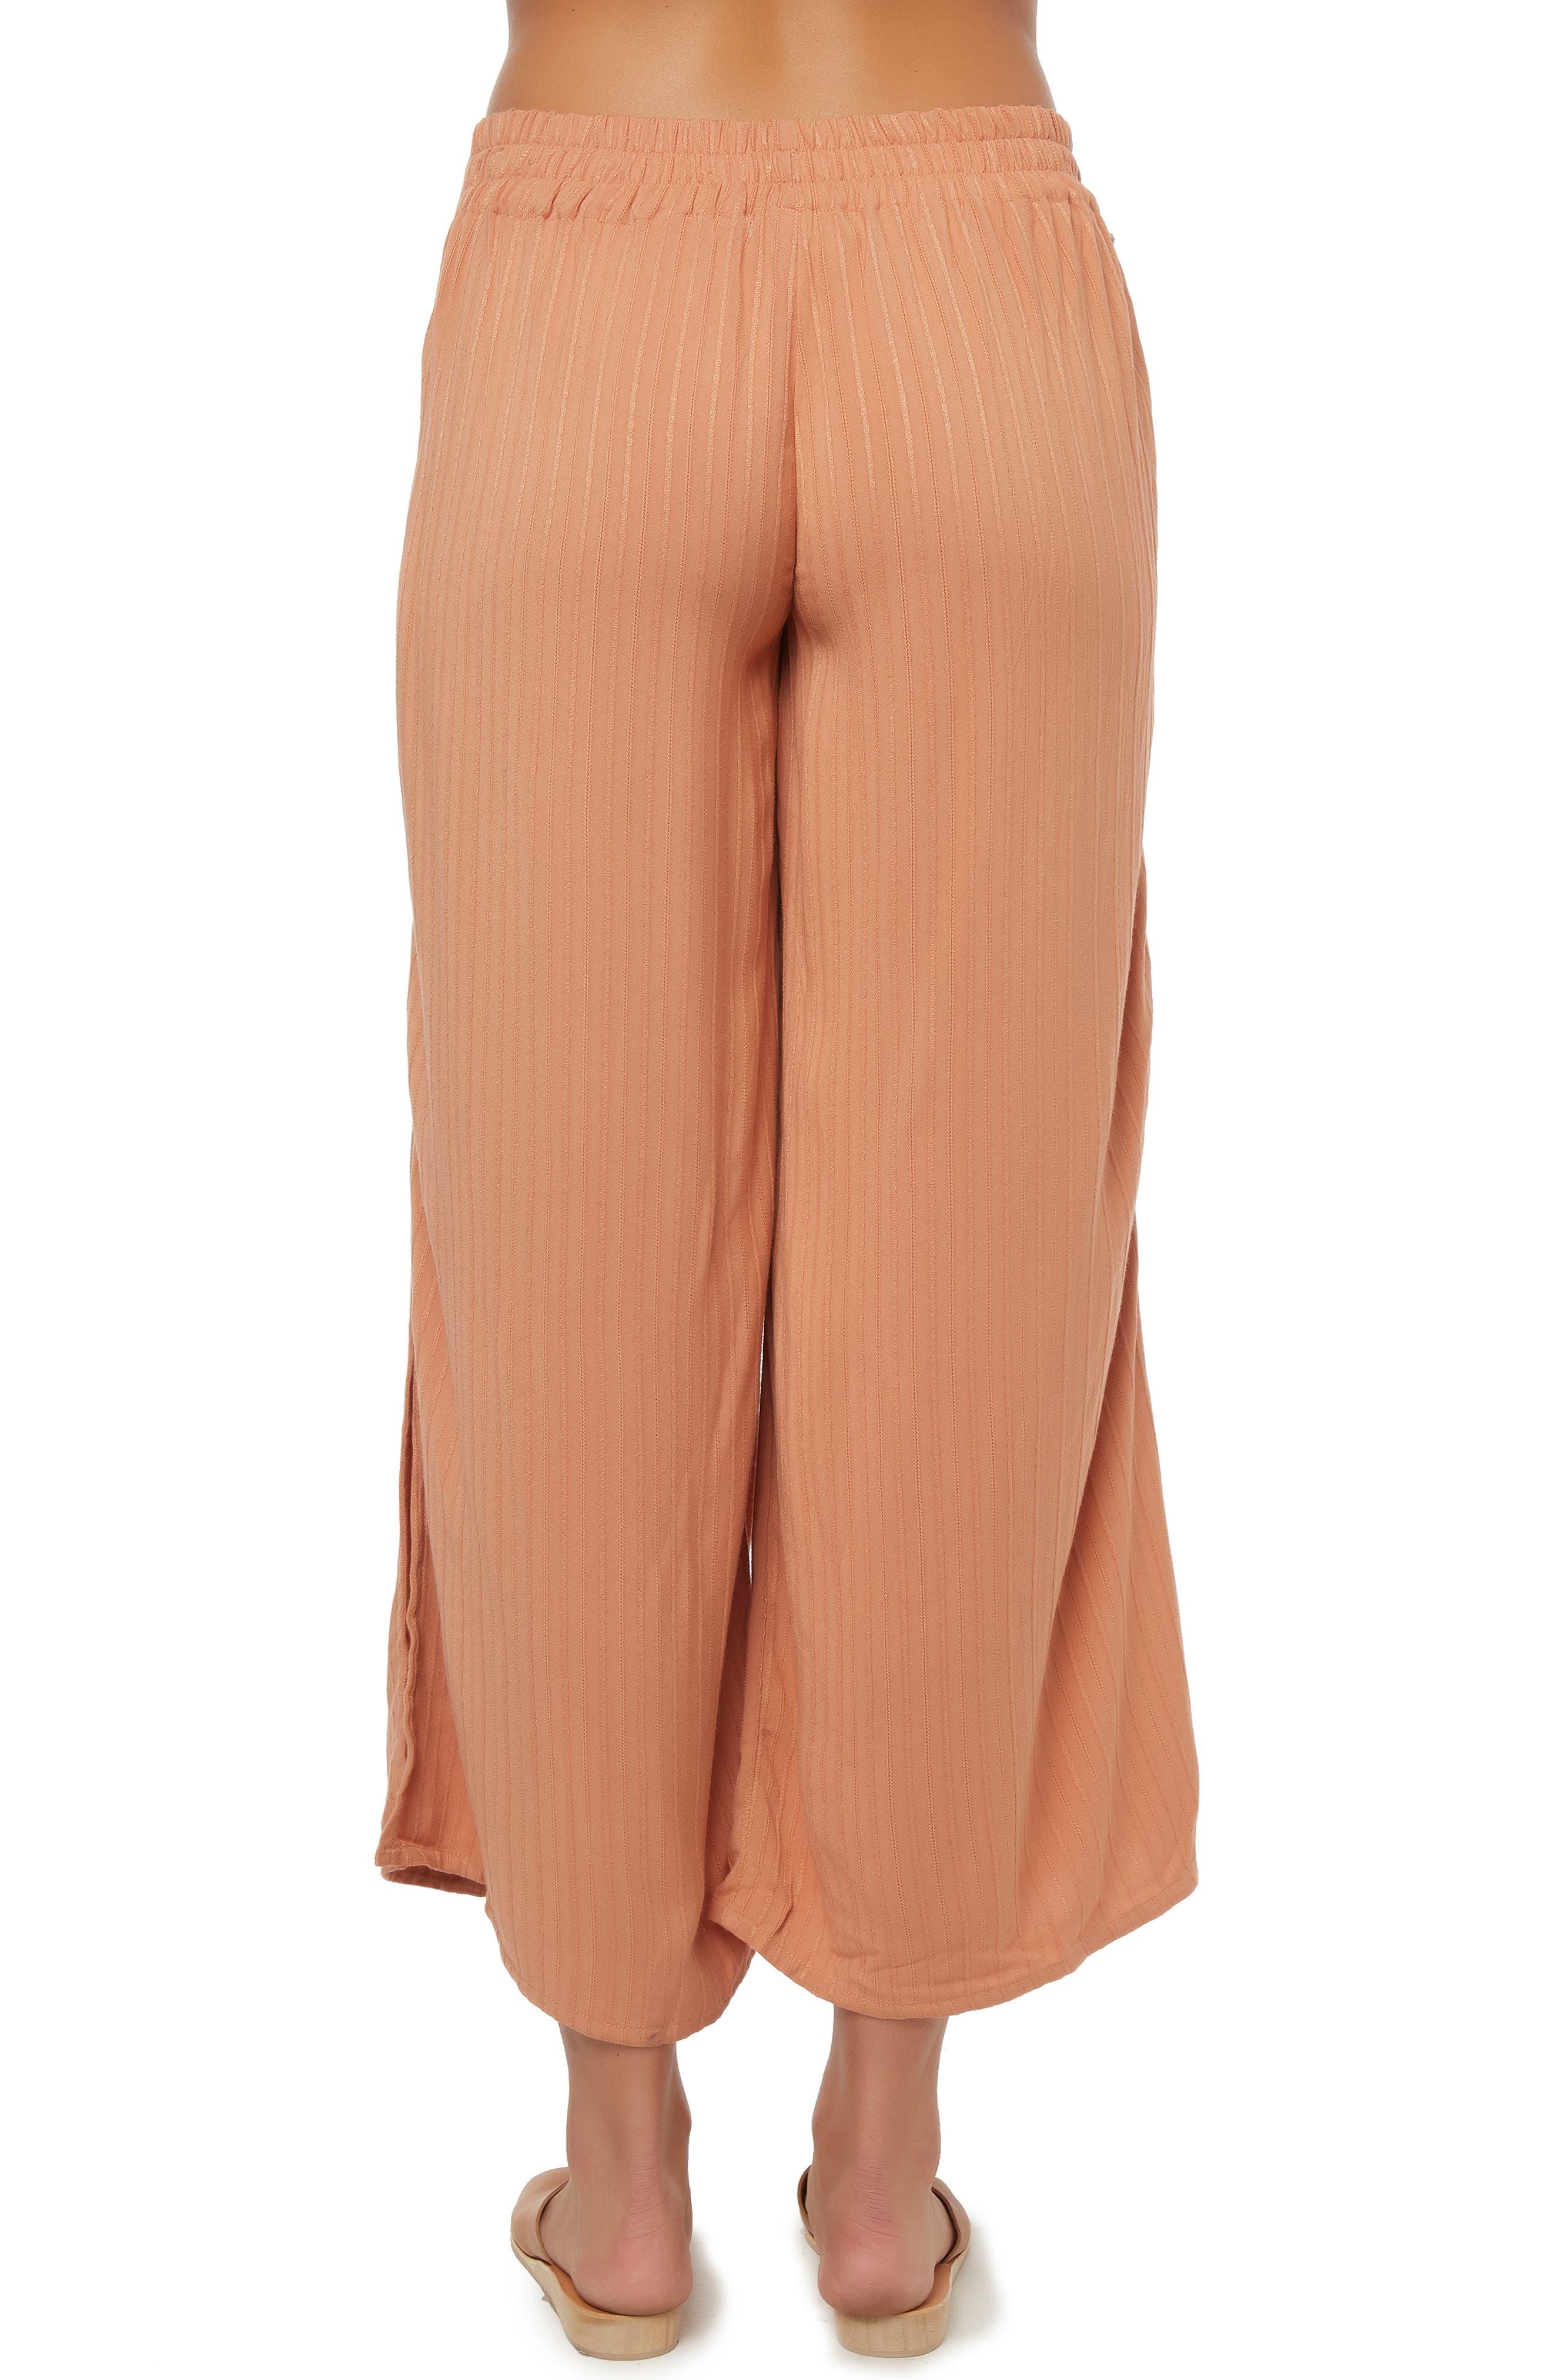 O'NEILL, Rayna Wide Leg Crop Pants, Alternate thumbnail 2, color, CORK